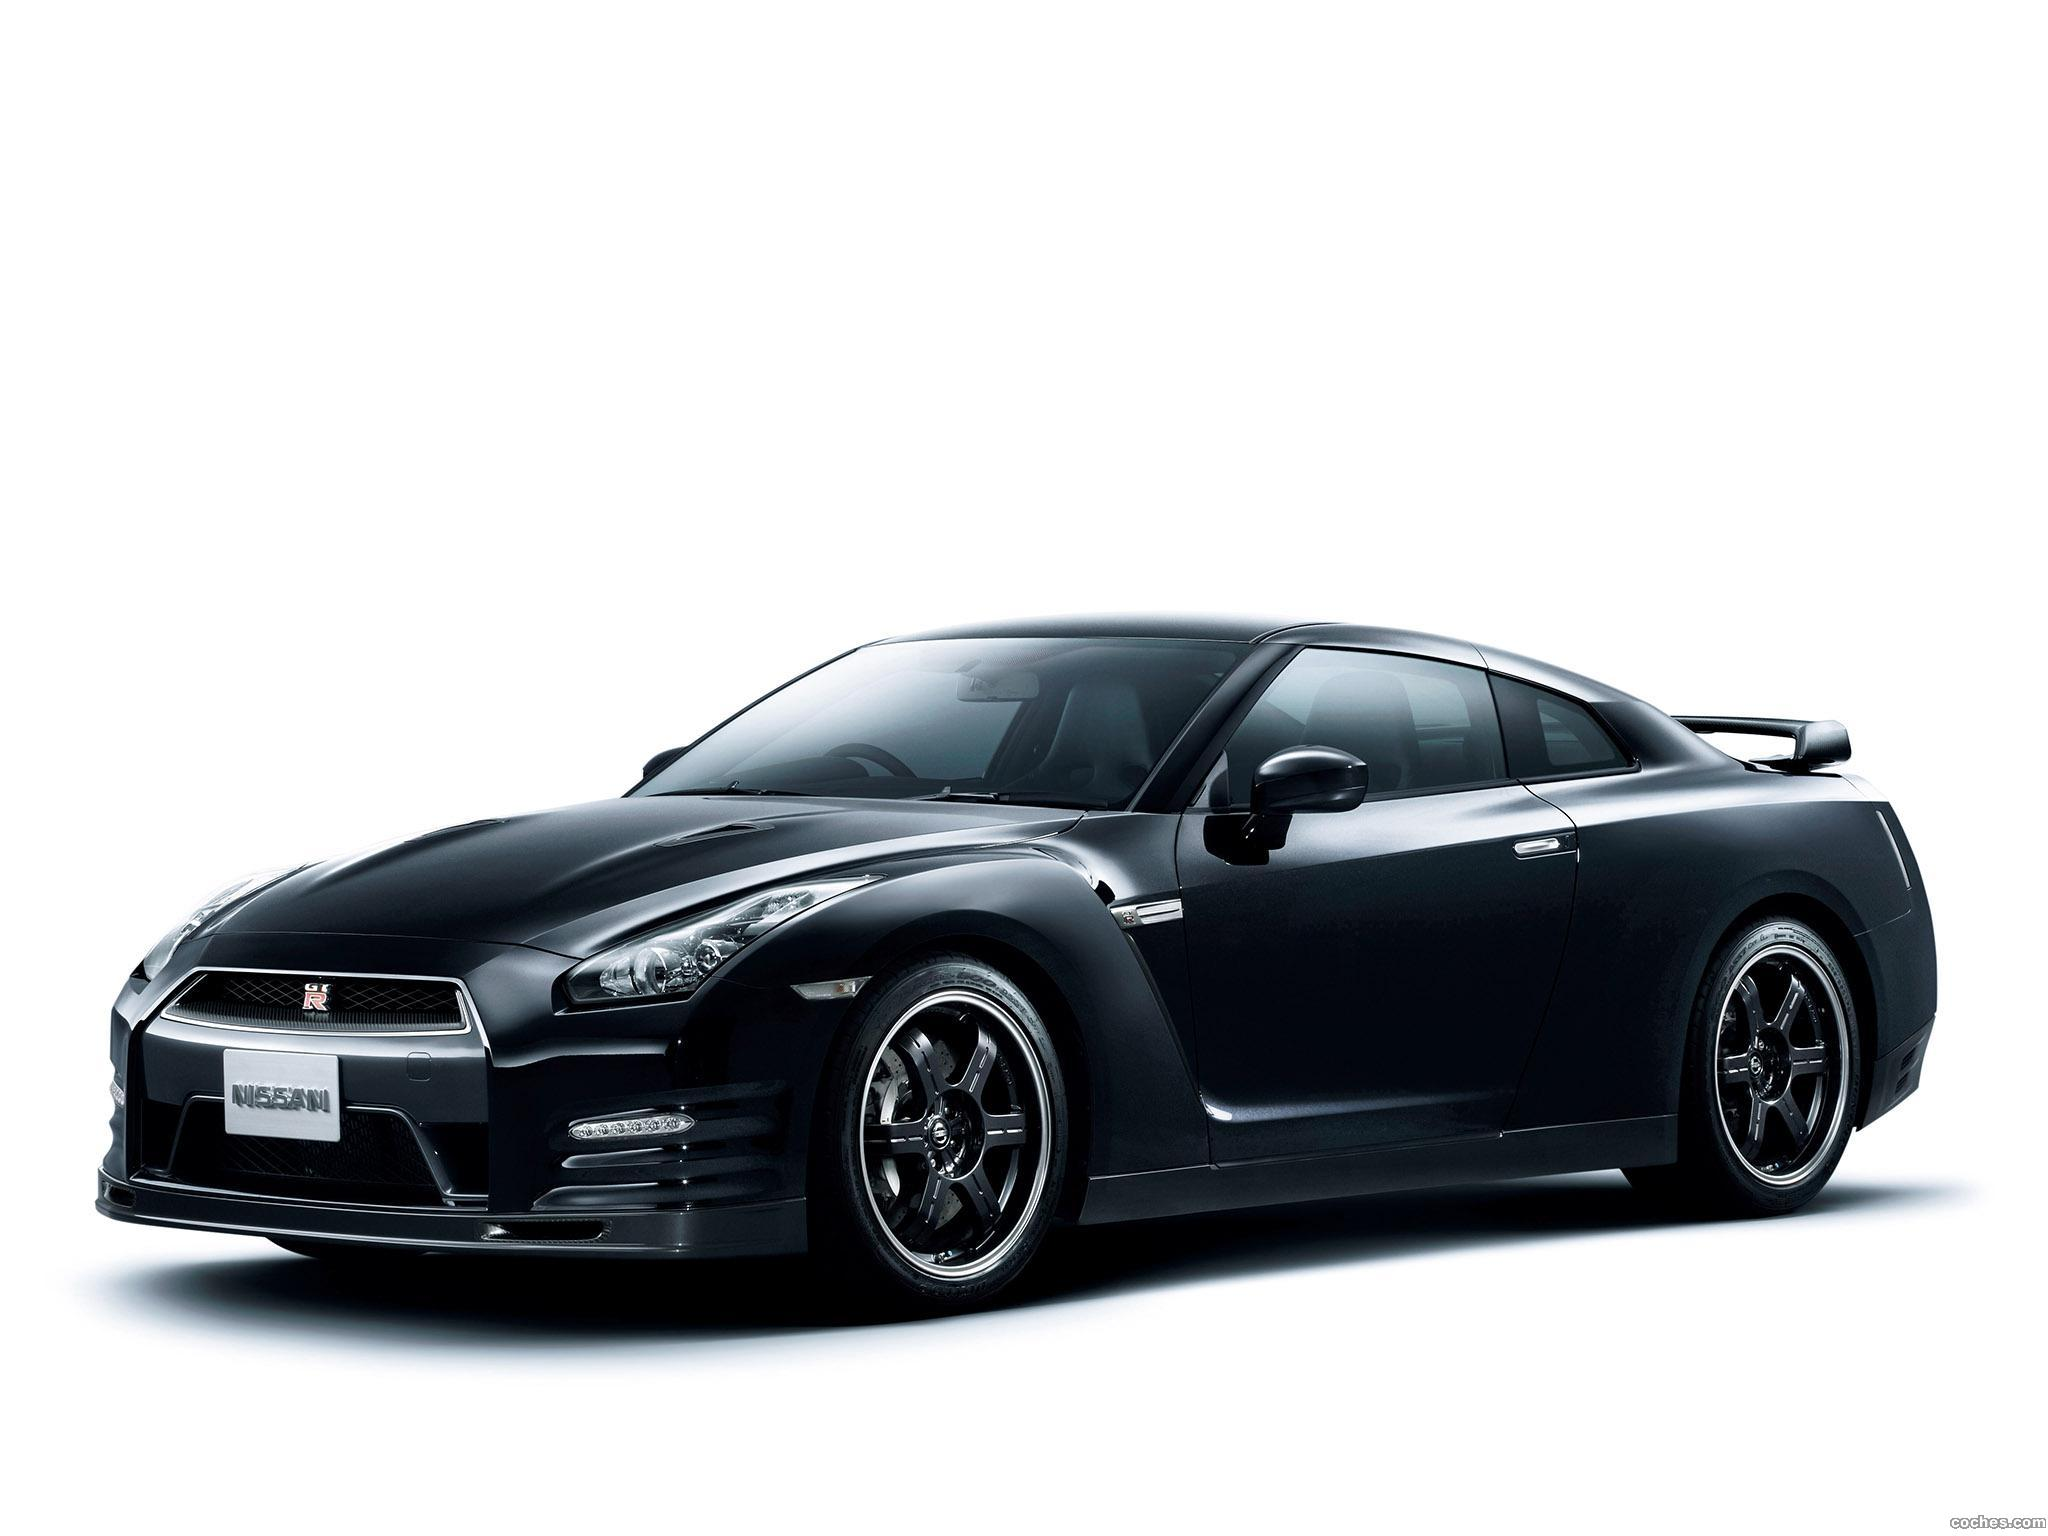 Foto 0 de Nissan GT-R Spec-V 2010